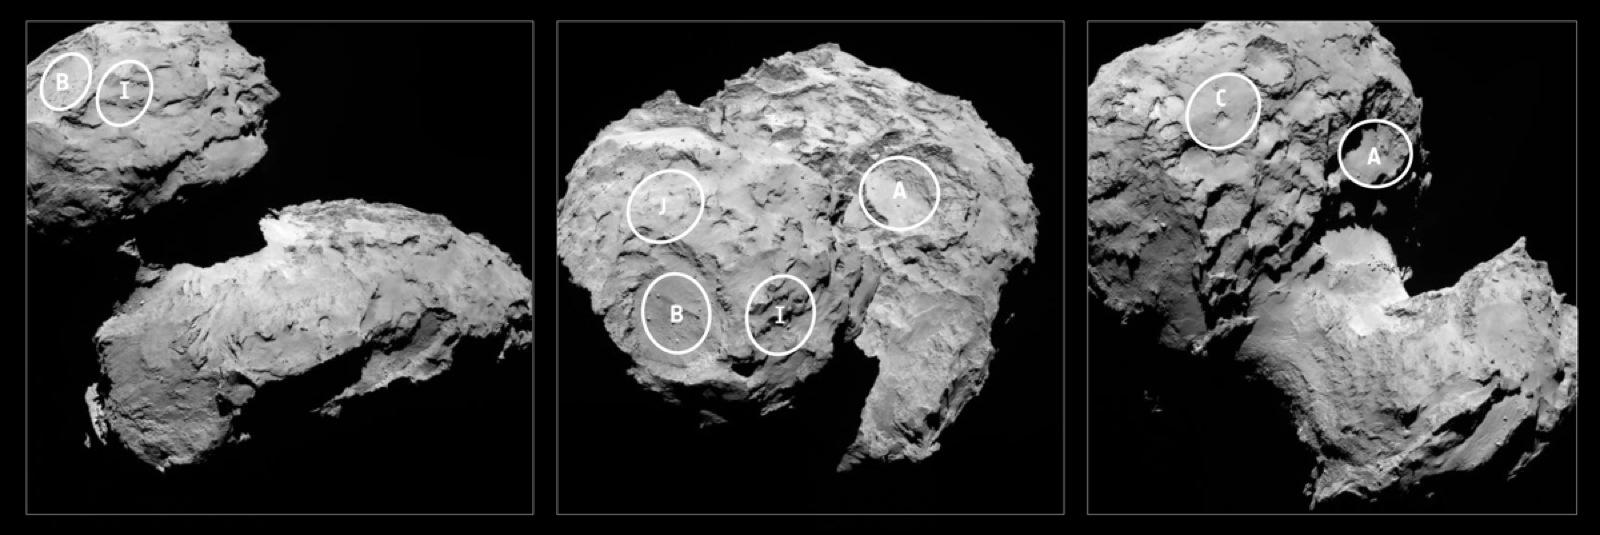 Candidate Landing Sites on Comet 67P/Churyumov-Gerasimenko